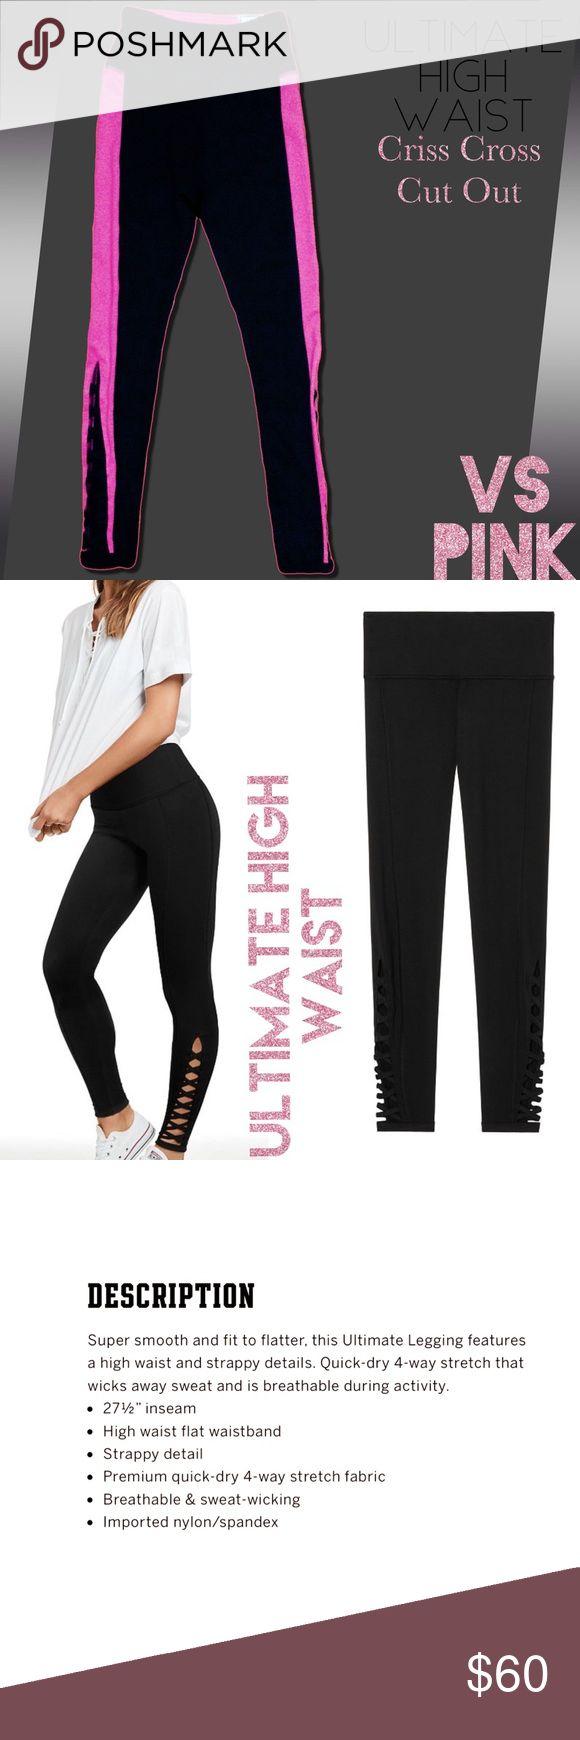 🆕VS PINK Ultimate High Waist Leggings Bright Pink & Black Ultimate High Waist Criss Cross Leggings PINK Victoria's Secret Pants Leggings